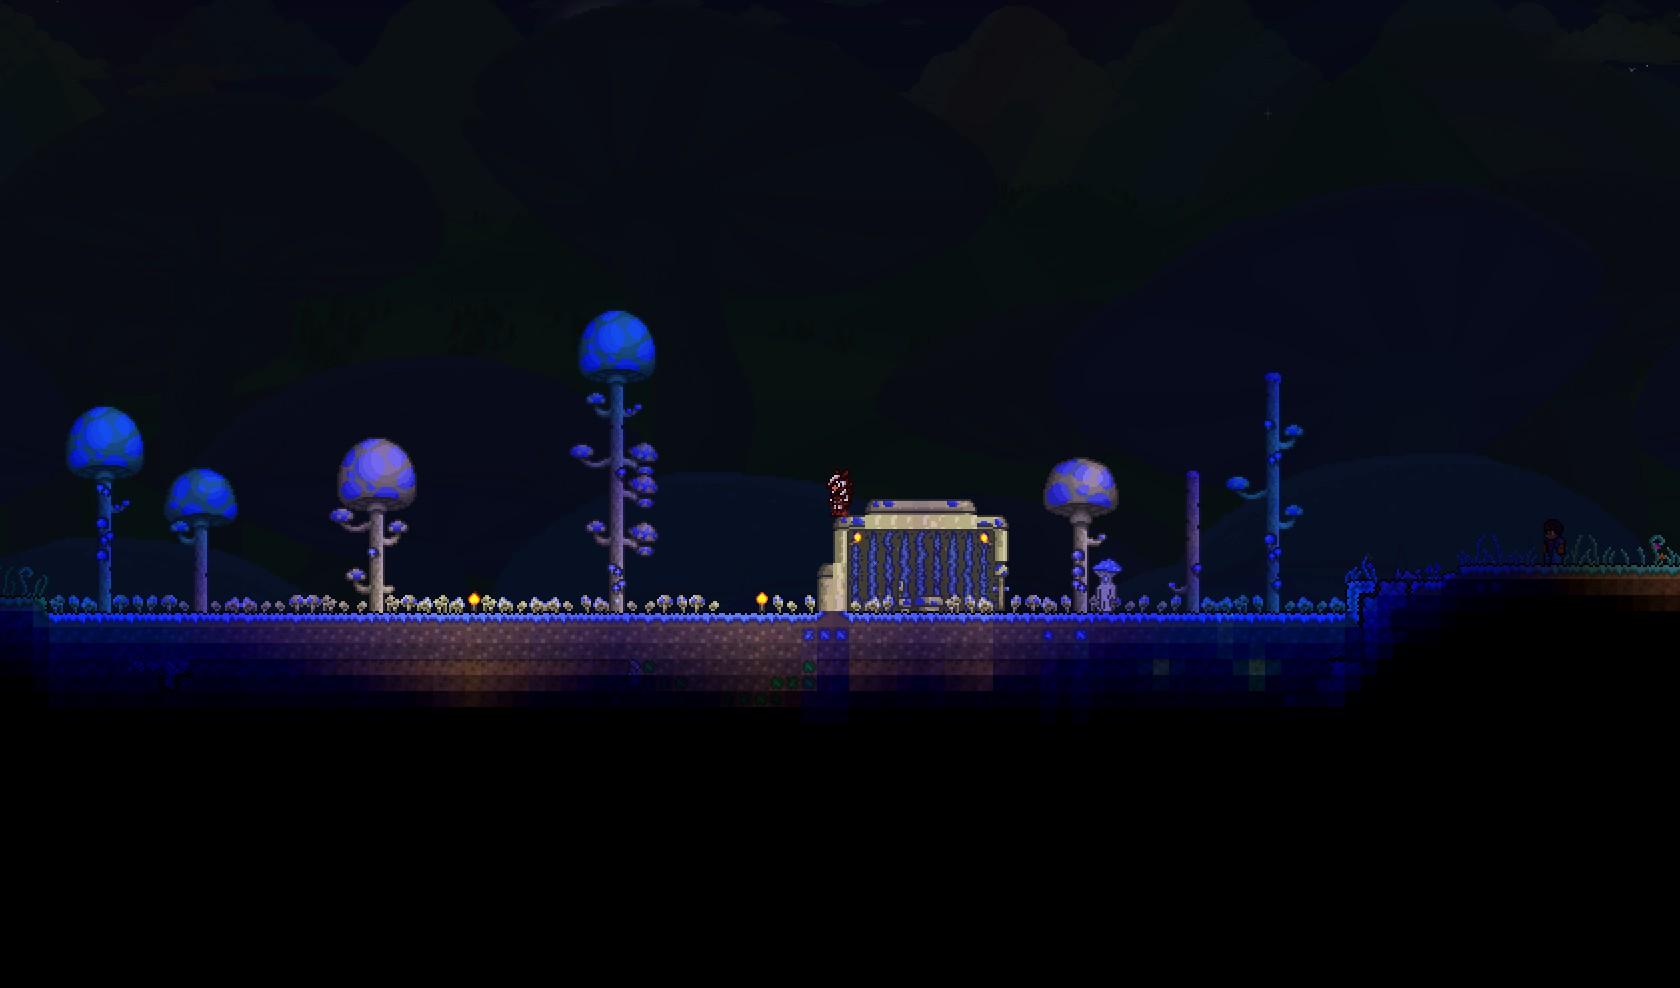 Glowing Mushroom Biome Terraria Wiki Fandom Powered By